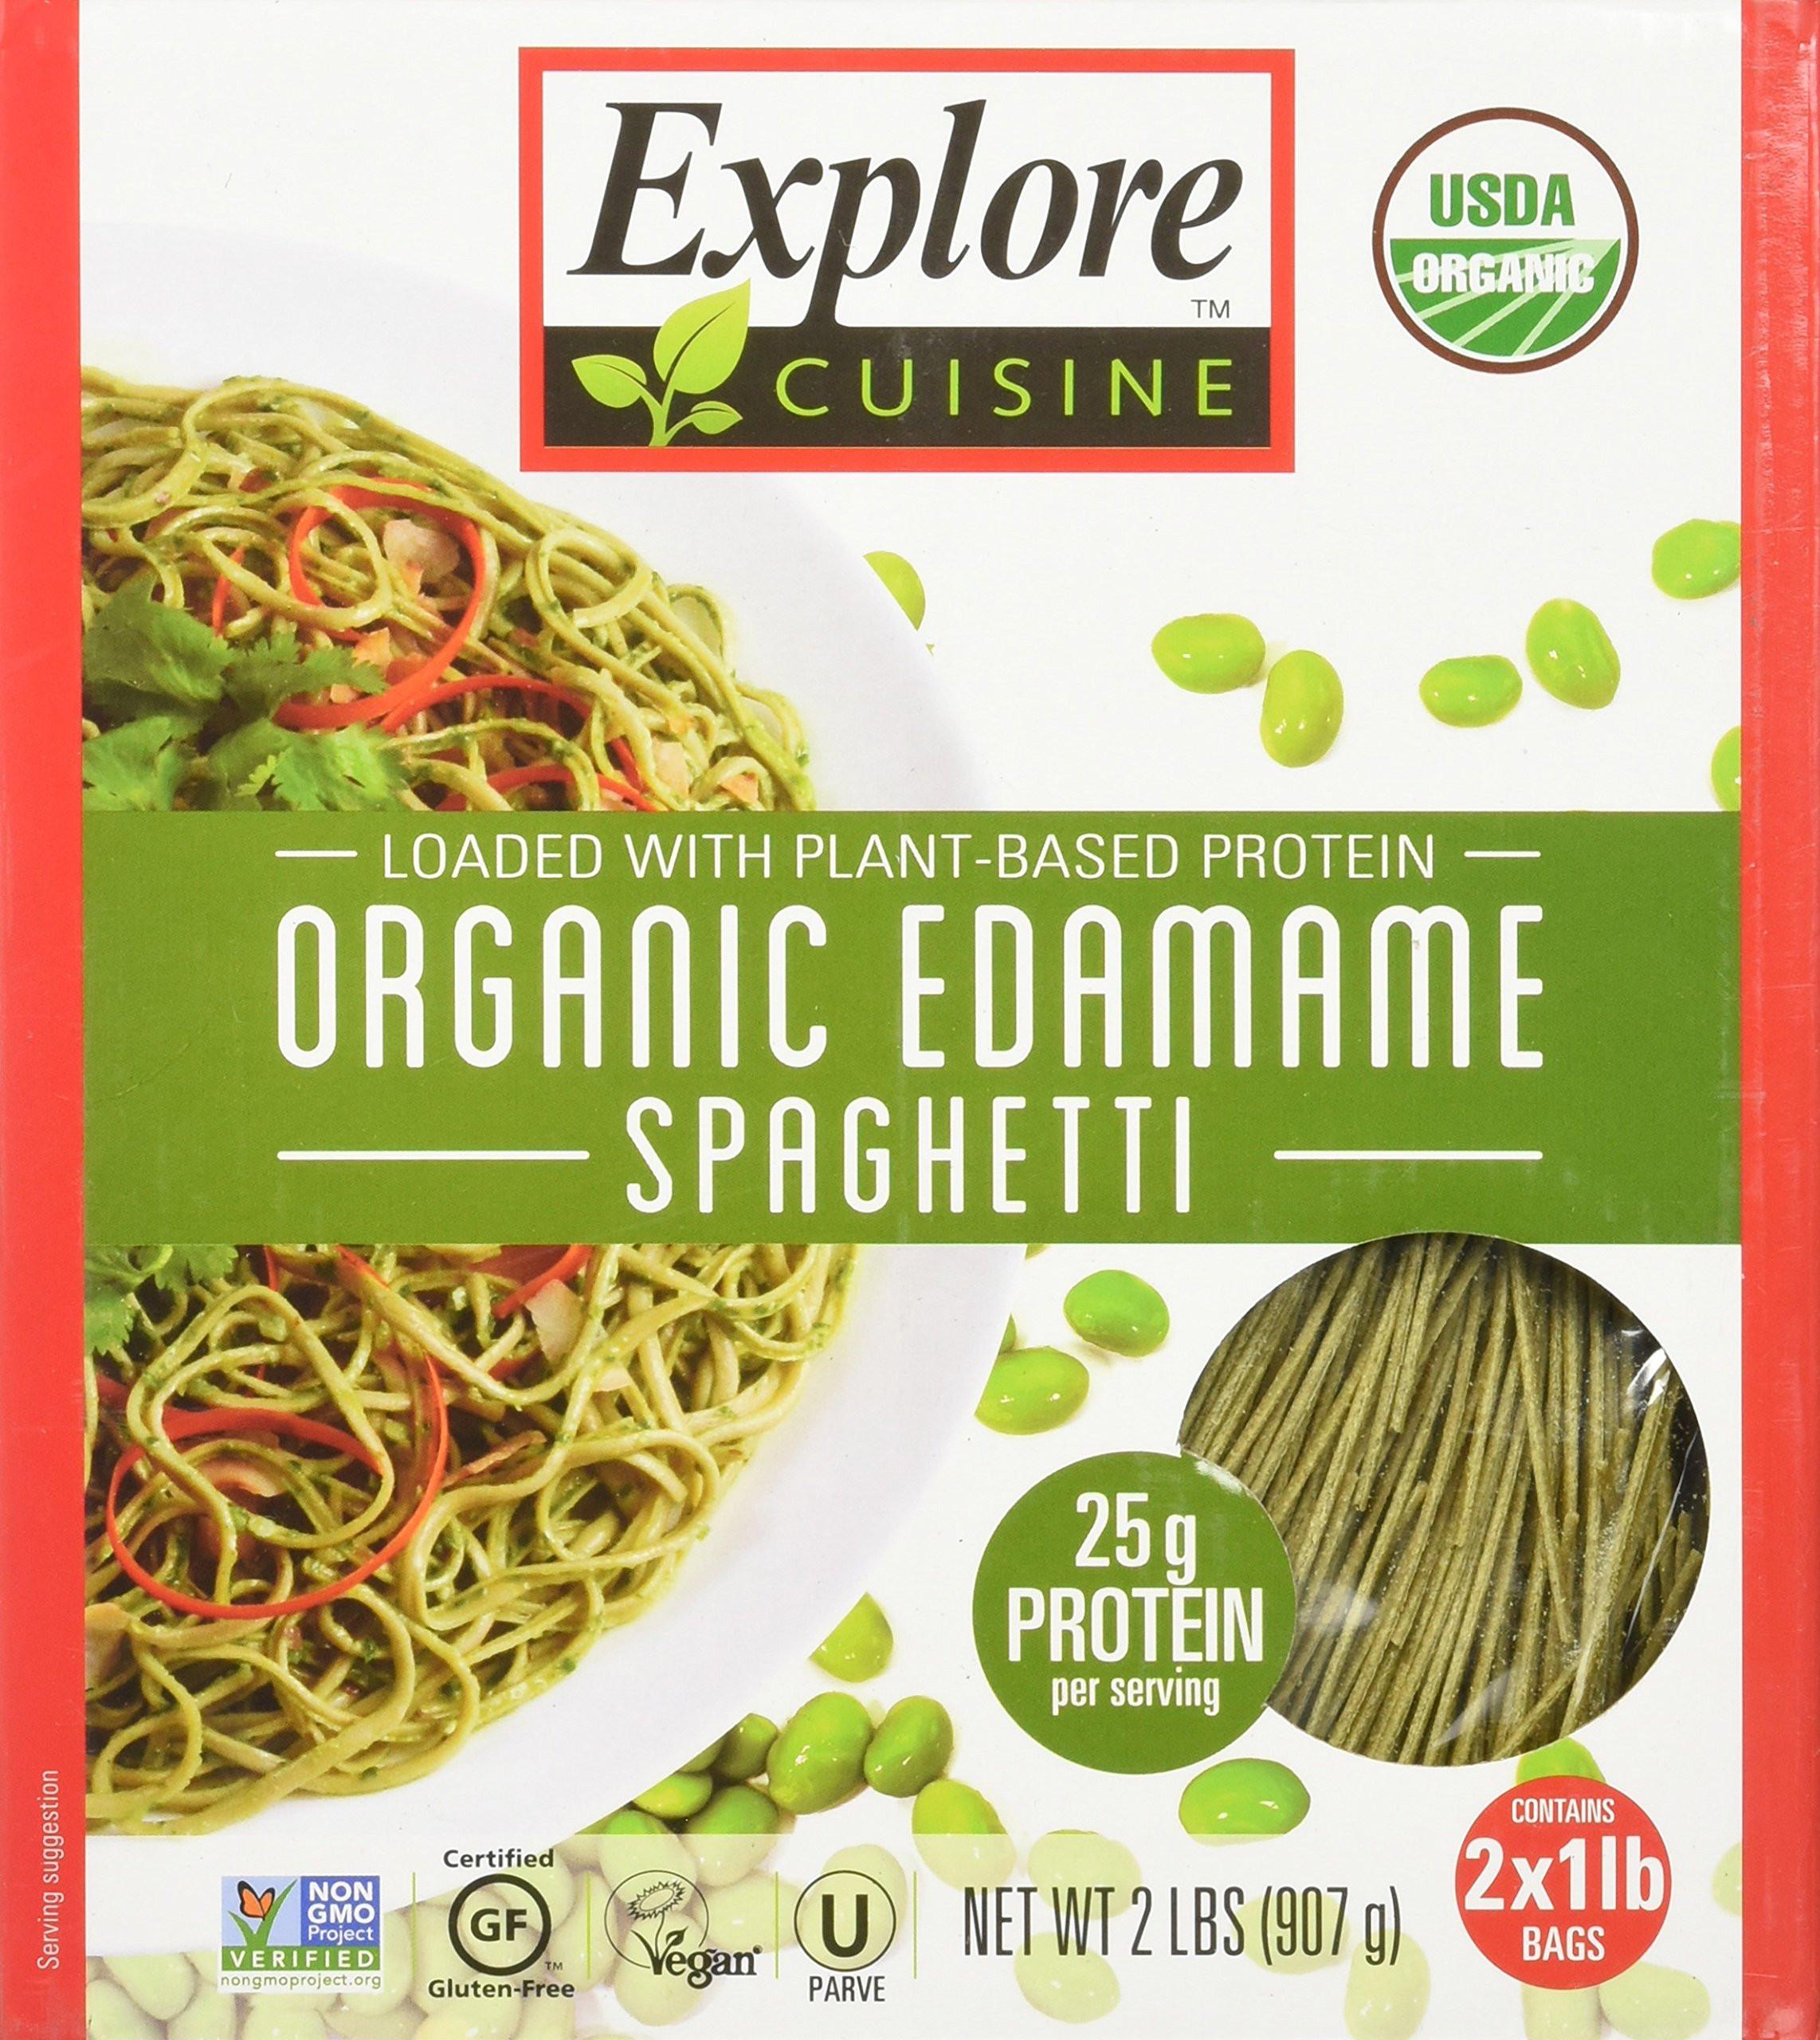 Organic Edamame Spaghetti  Amazon Explore Asia Organic Black Bean Spaghetti 8